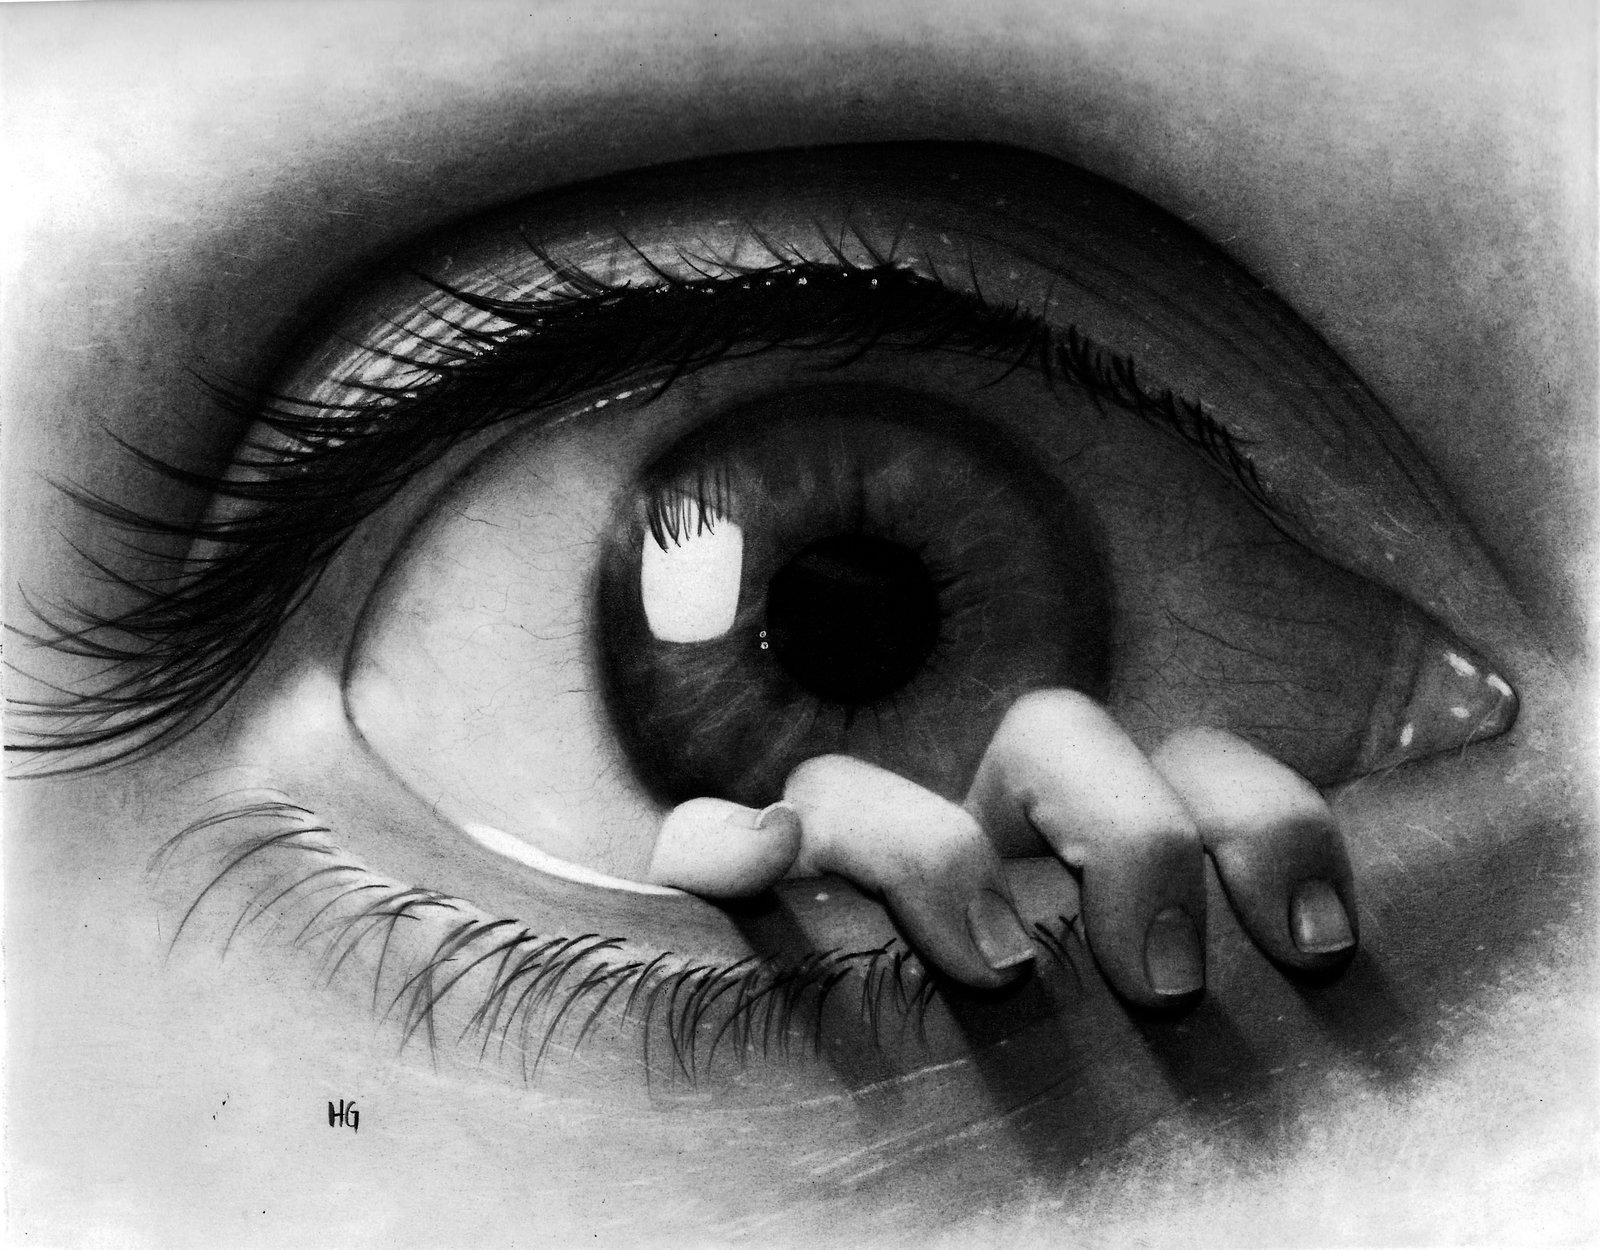 Drawn eyeball black and white Background HD  Black 1600x1250